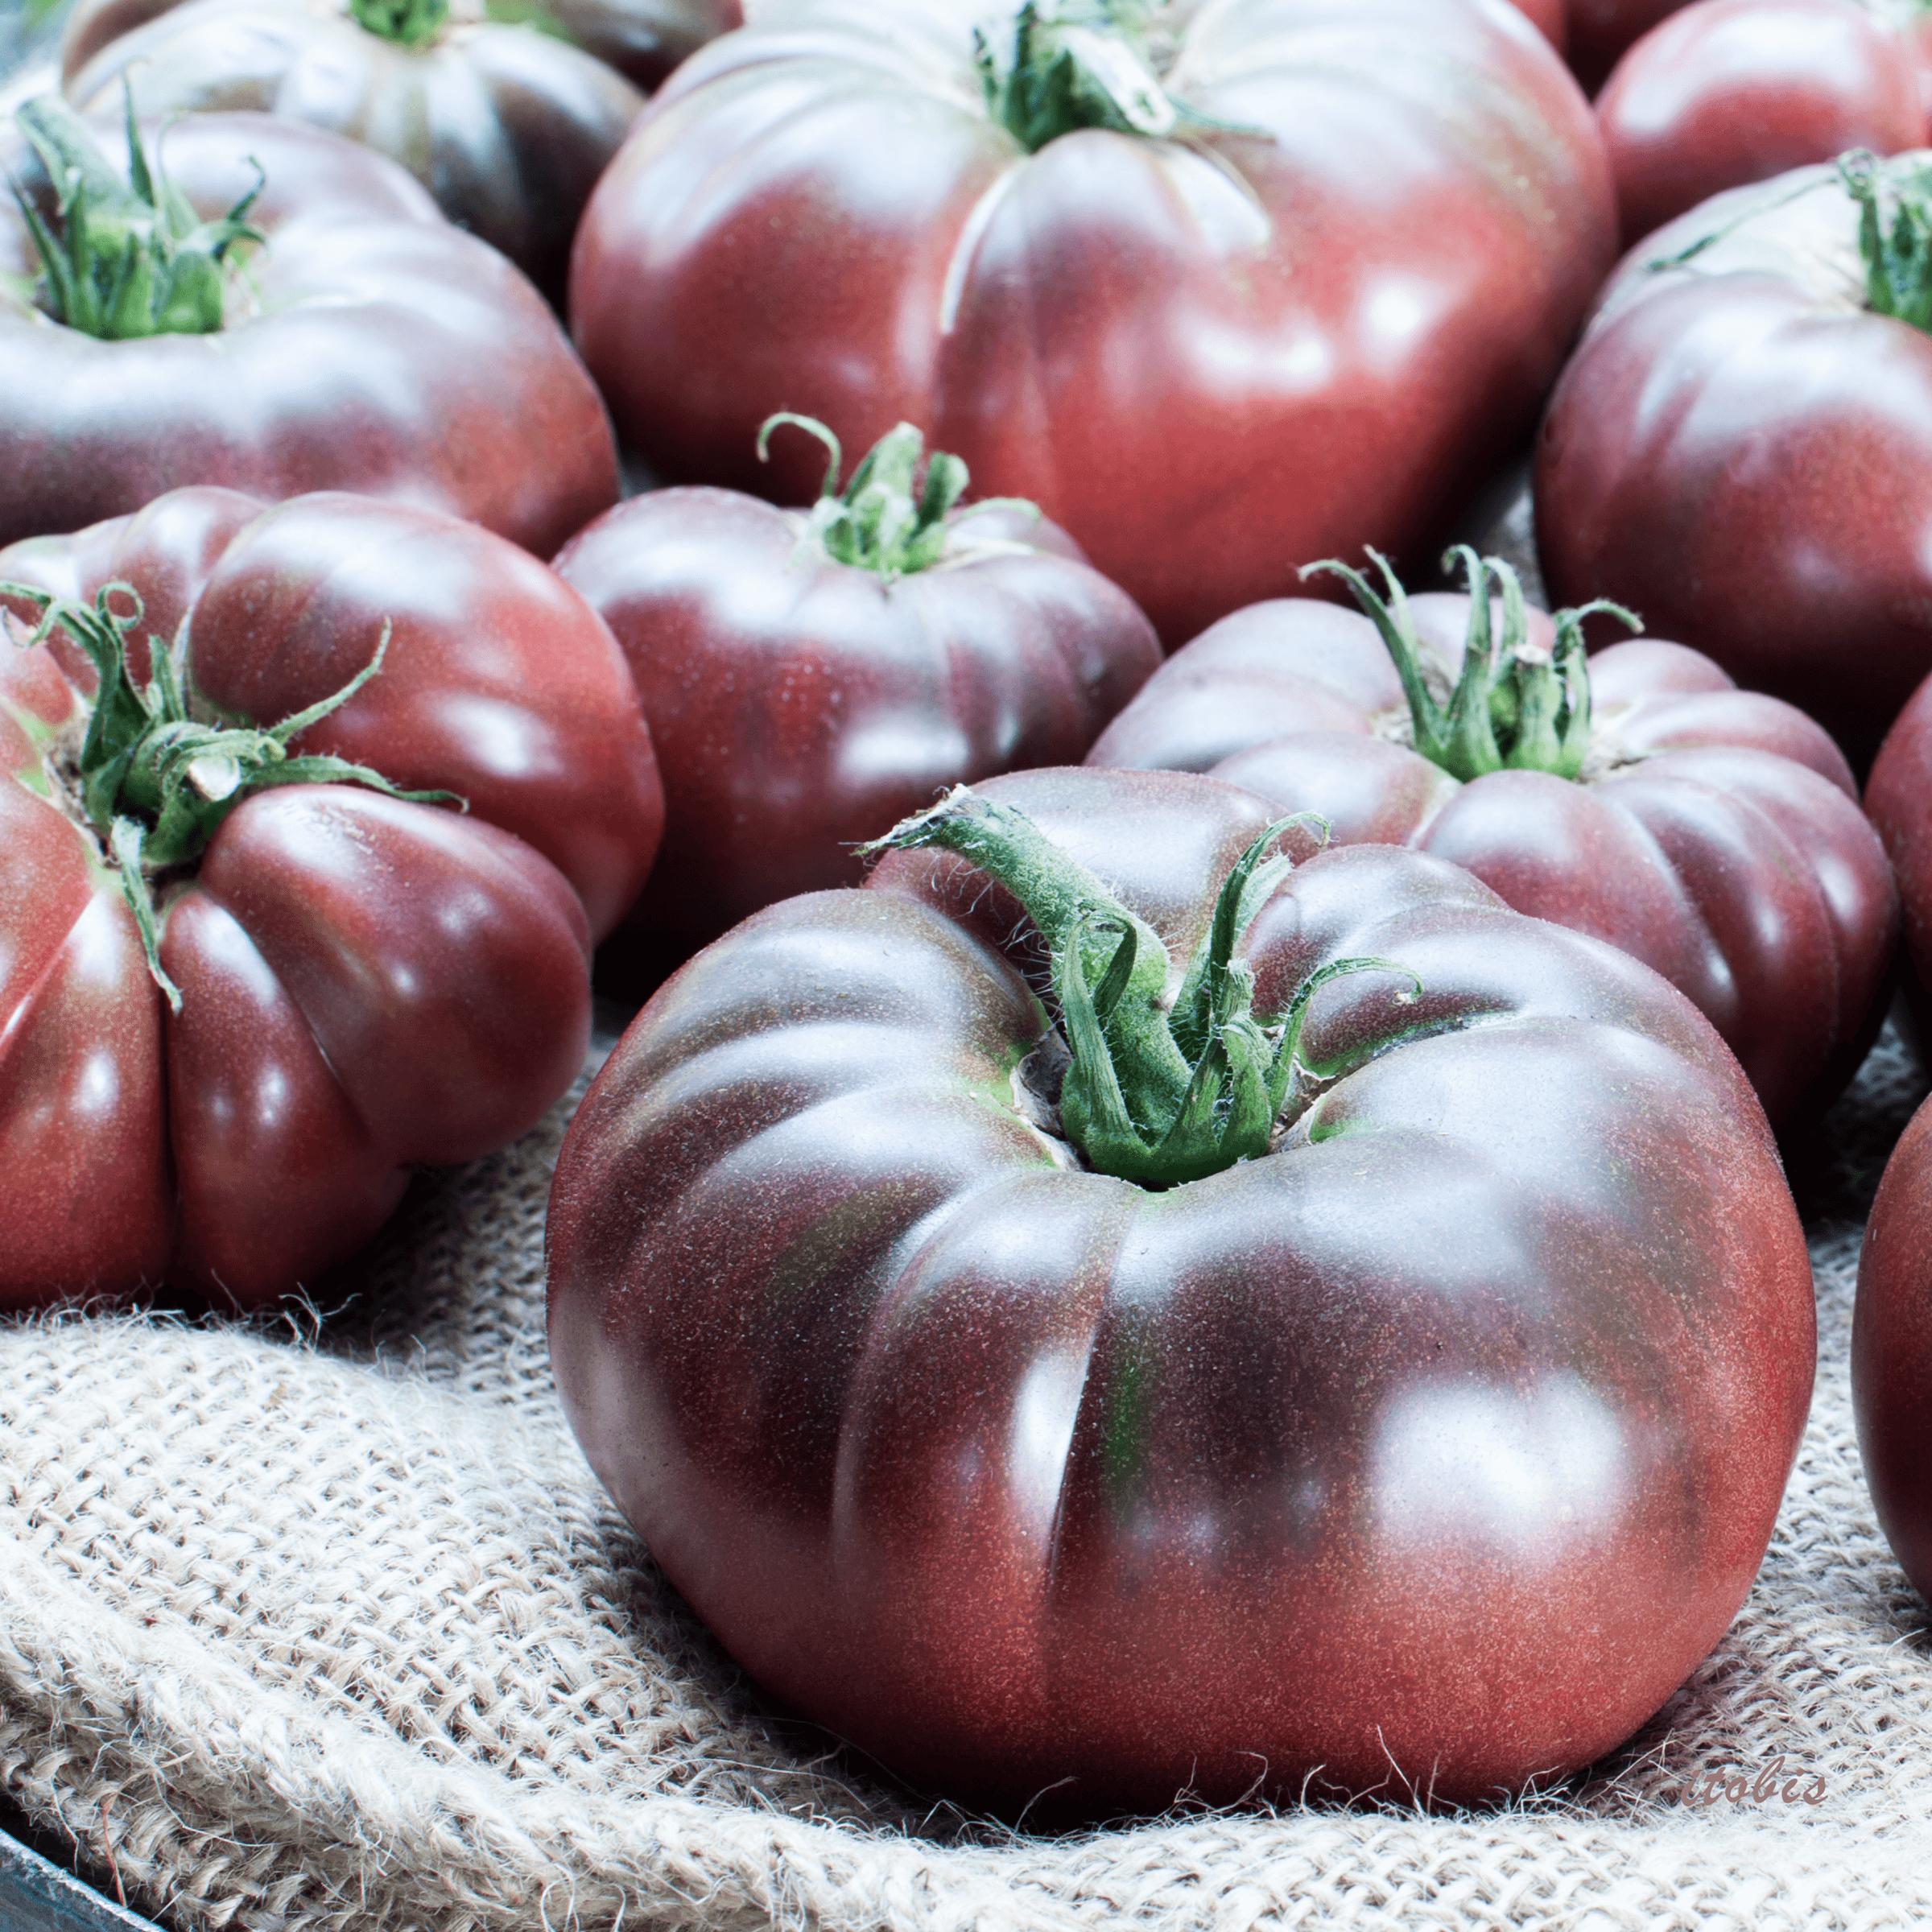 tomatoes-chocolate-farmersmarket-VF109-itobis.png